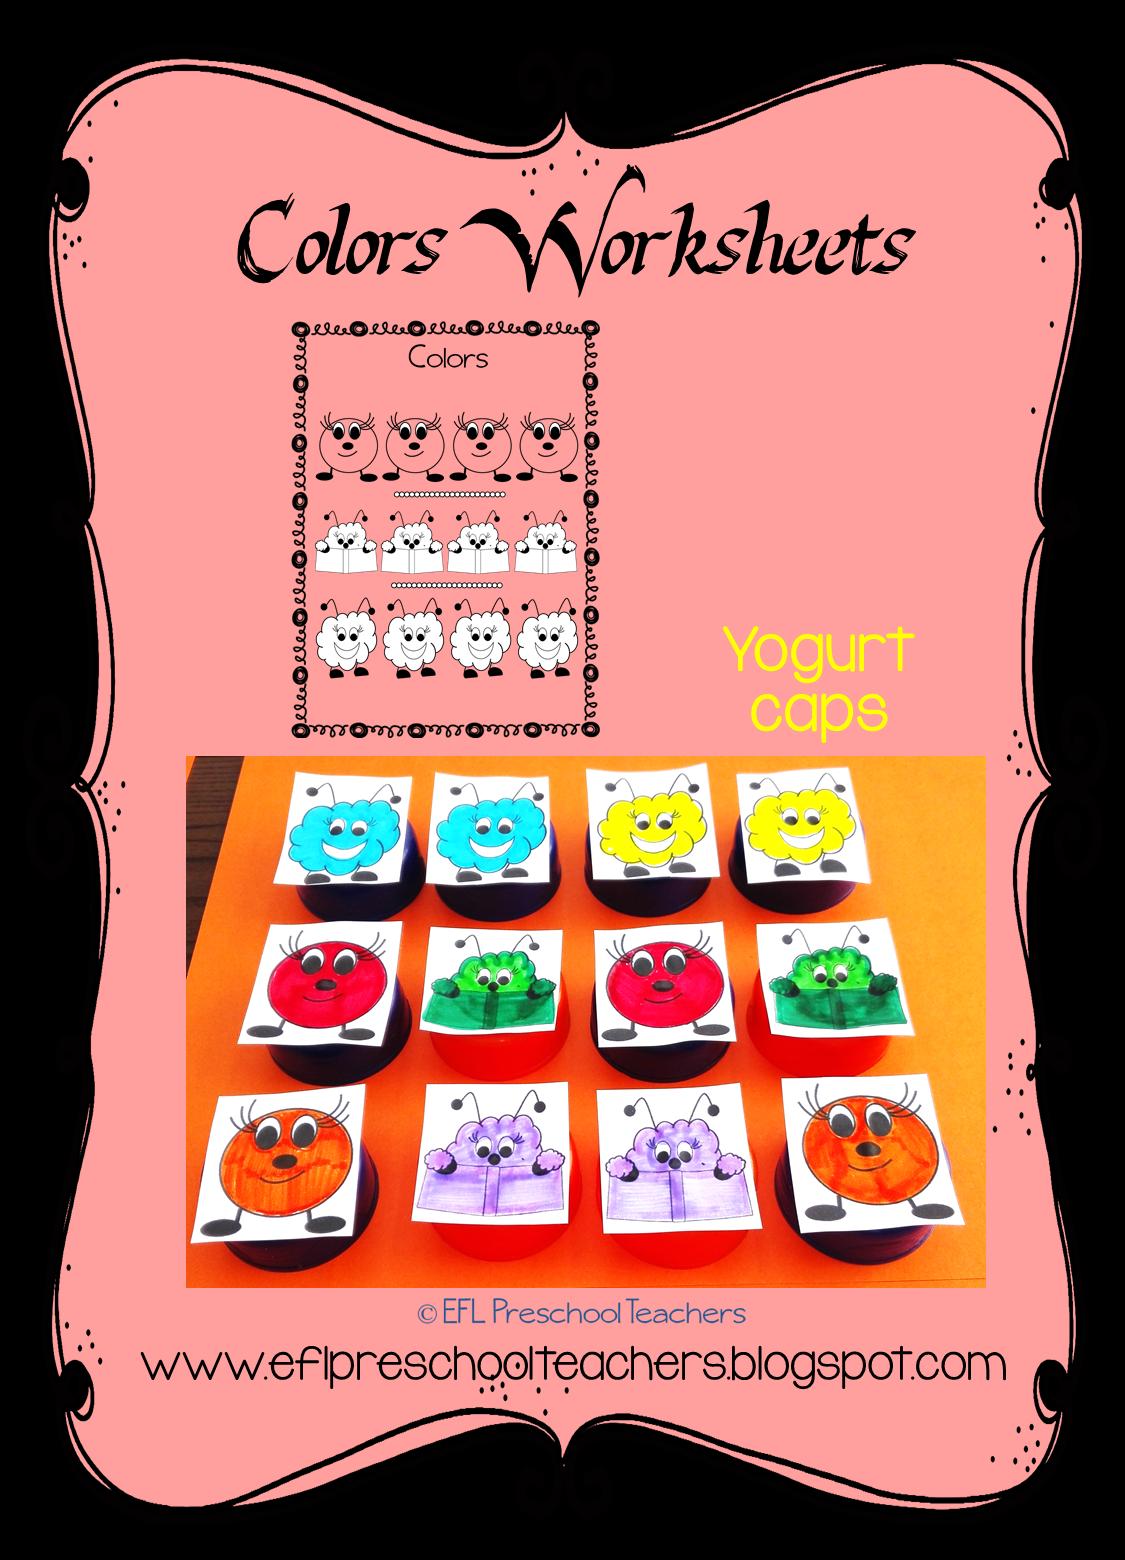 ESL/EFL Preschool Teachers: Color Worksheets